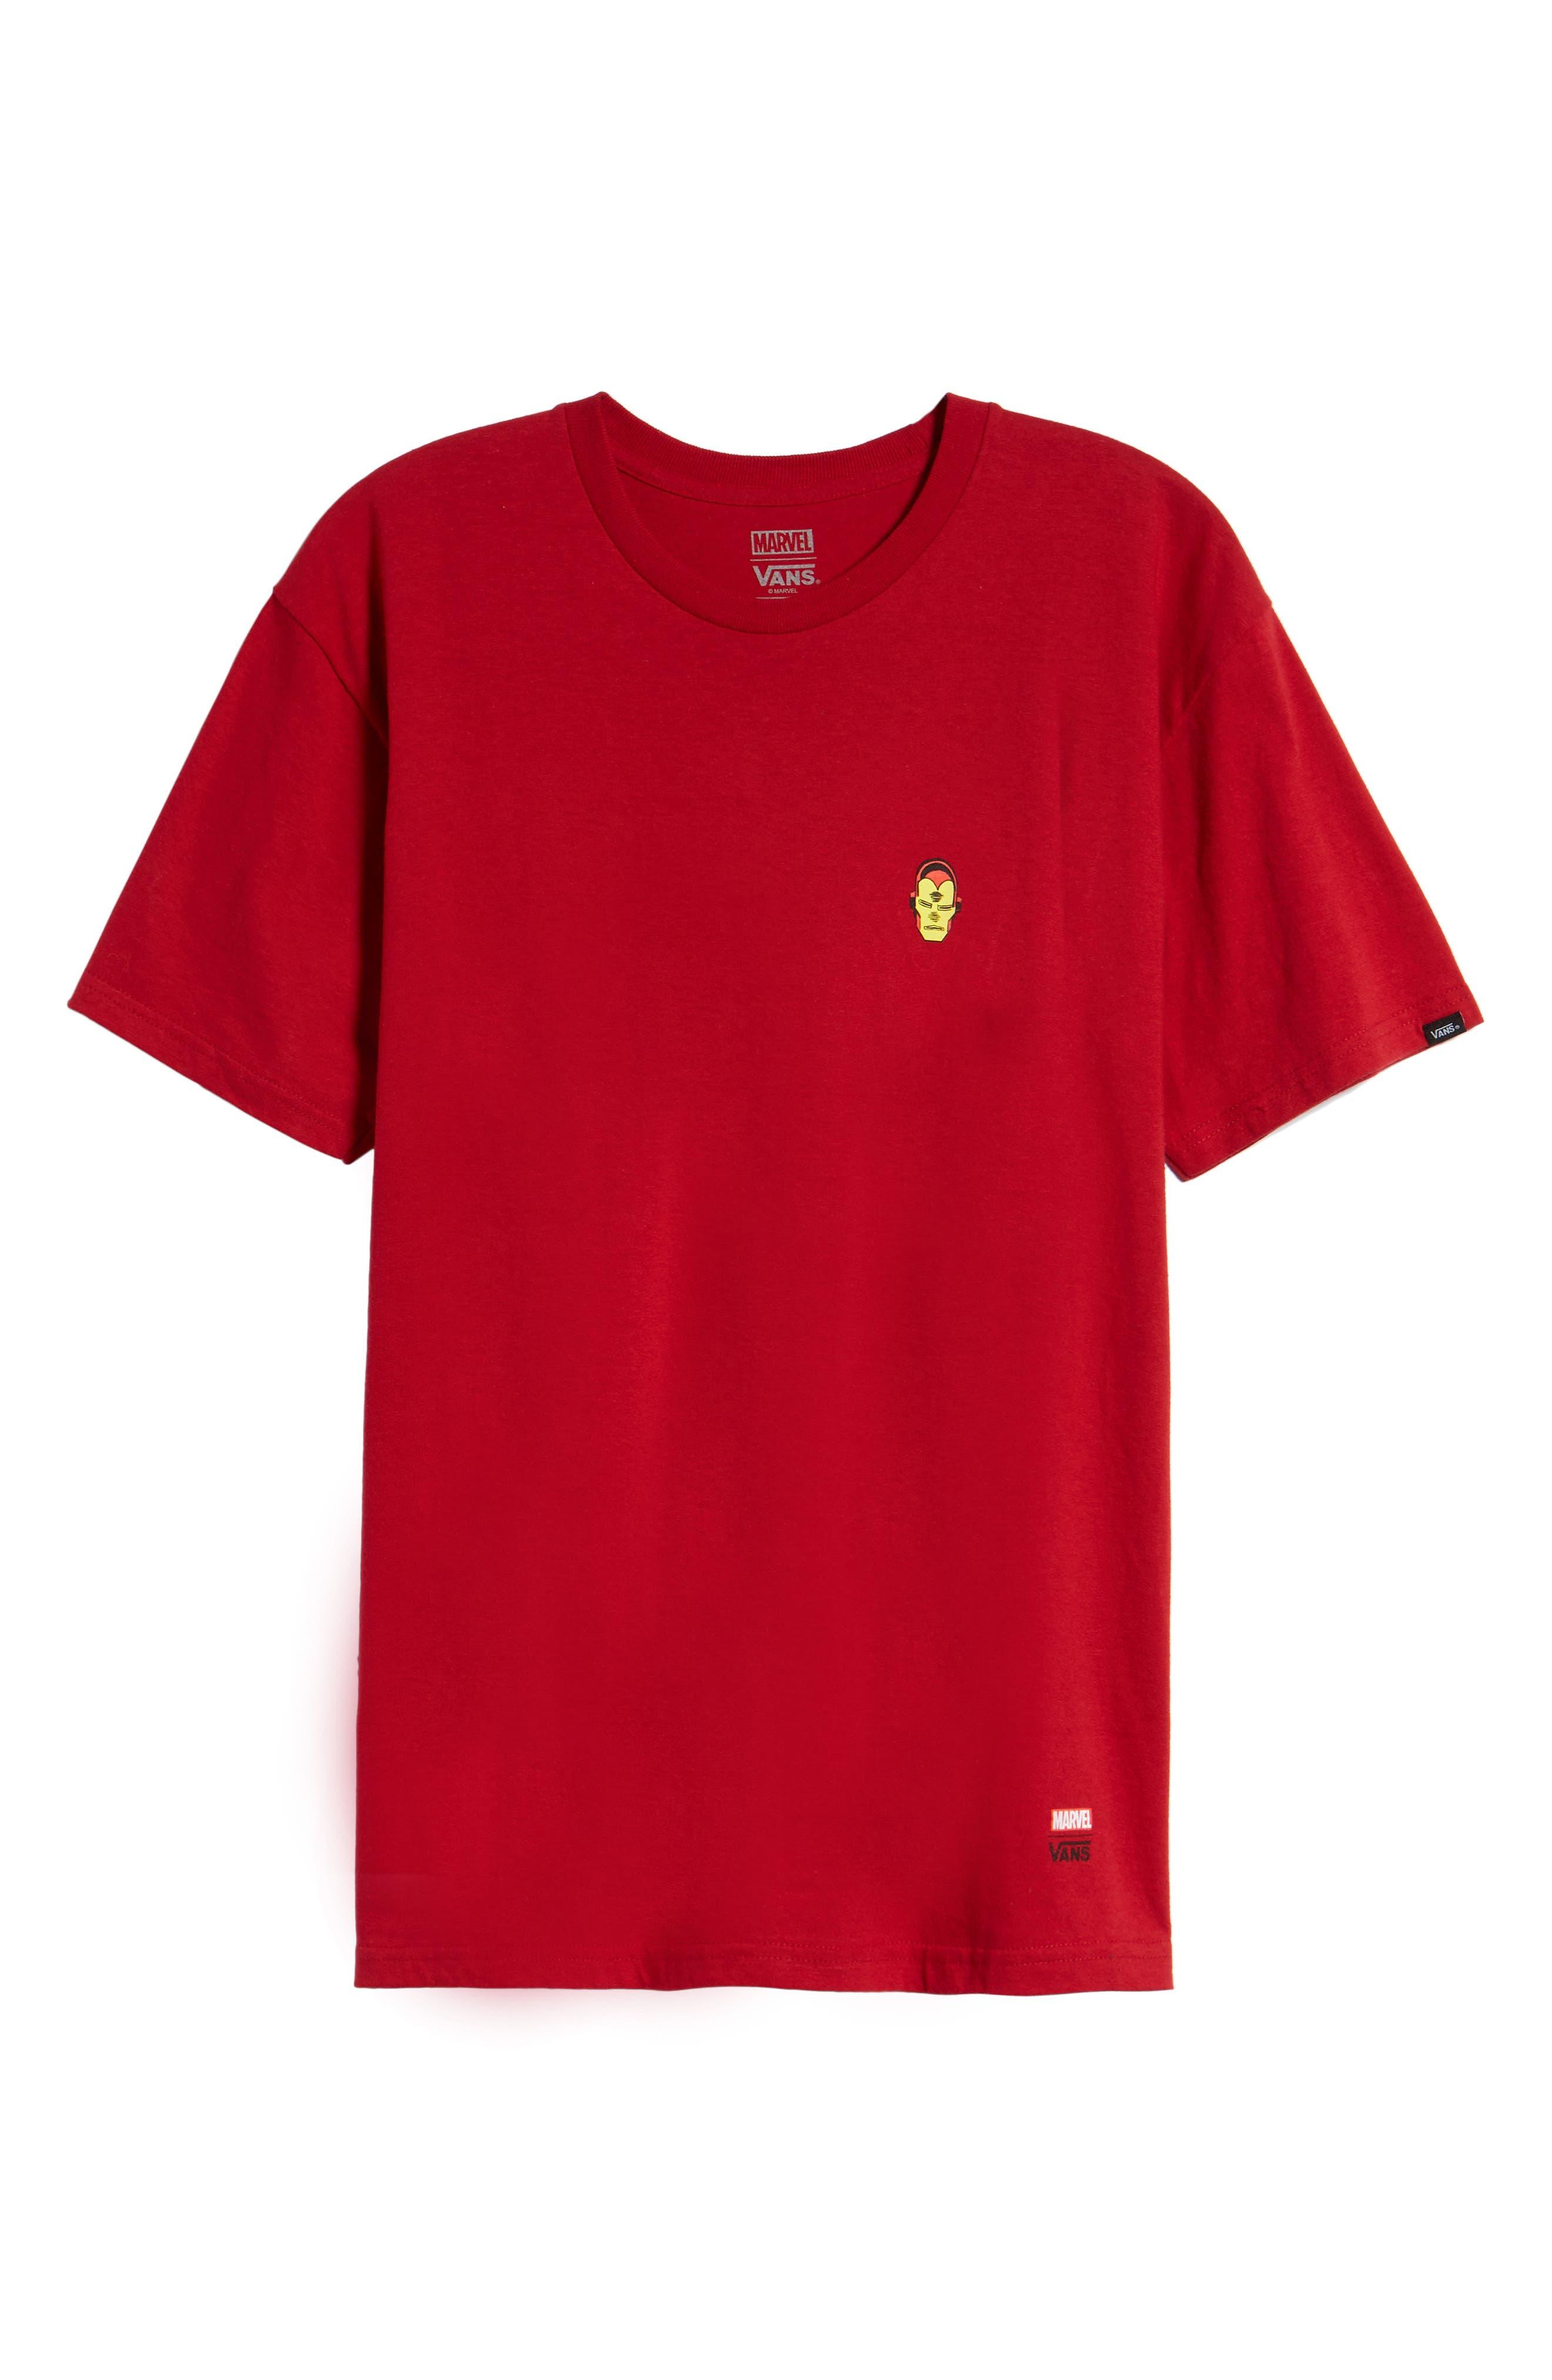 x Marvel<sup>®</sup> Iron Man T-Shirt,                             Alternate thumbnail 6, color,                             601